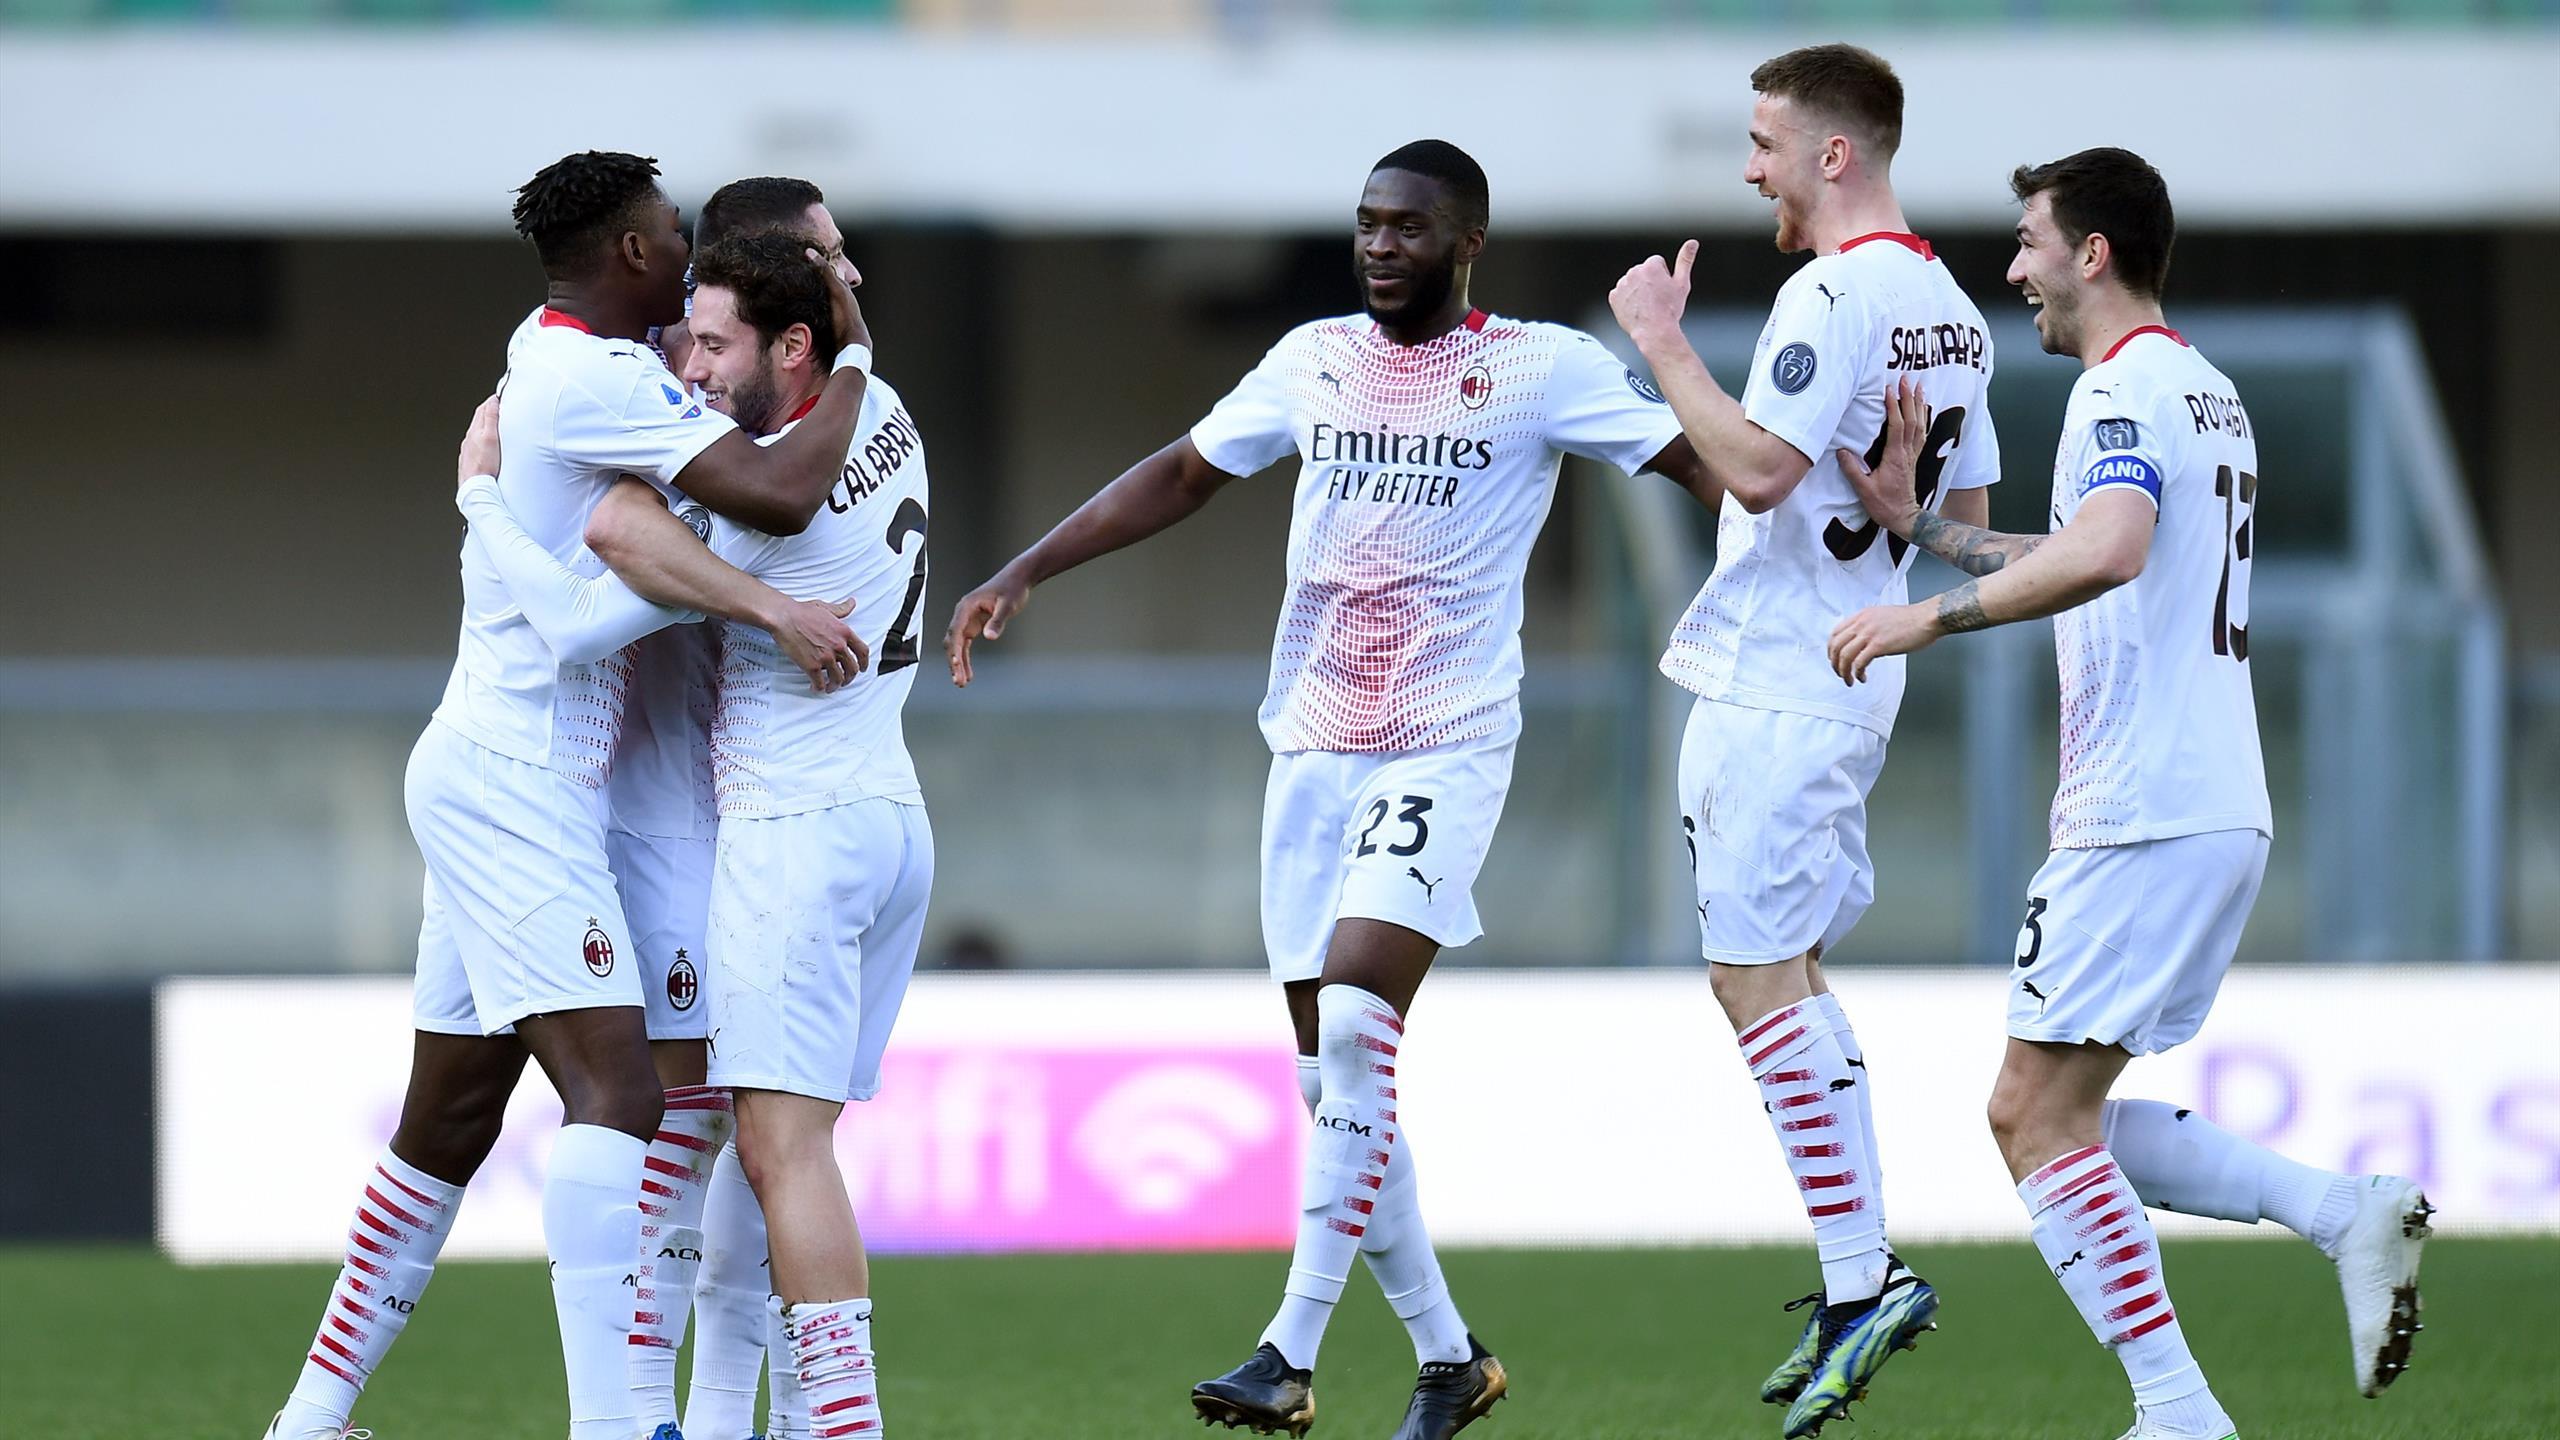 Serie A : Milan solide avant son choc face à Manchester United - Eurosport FR